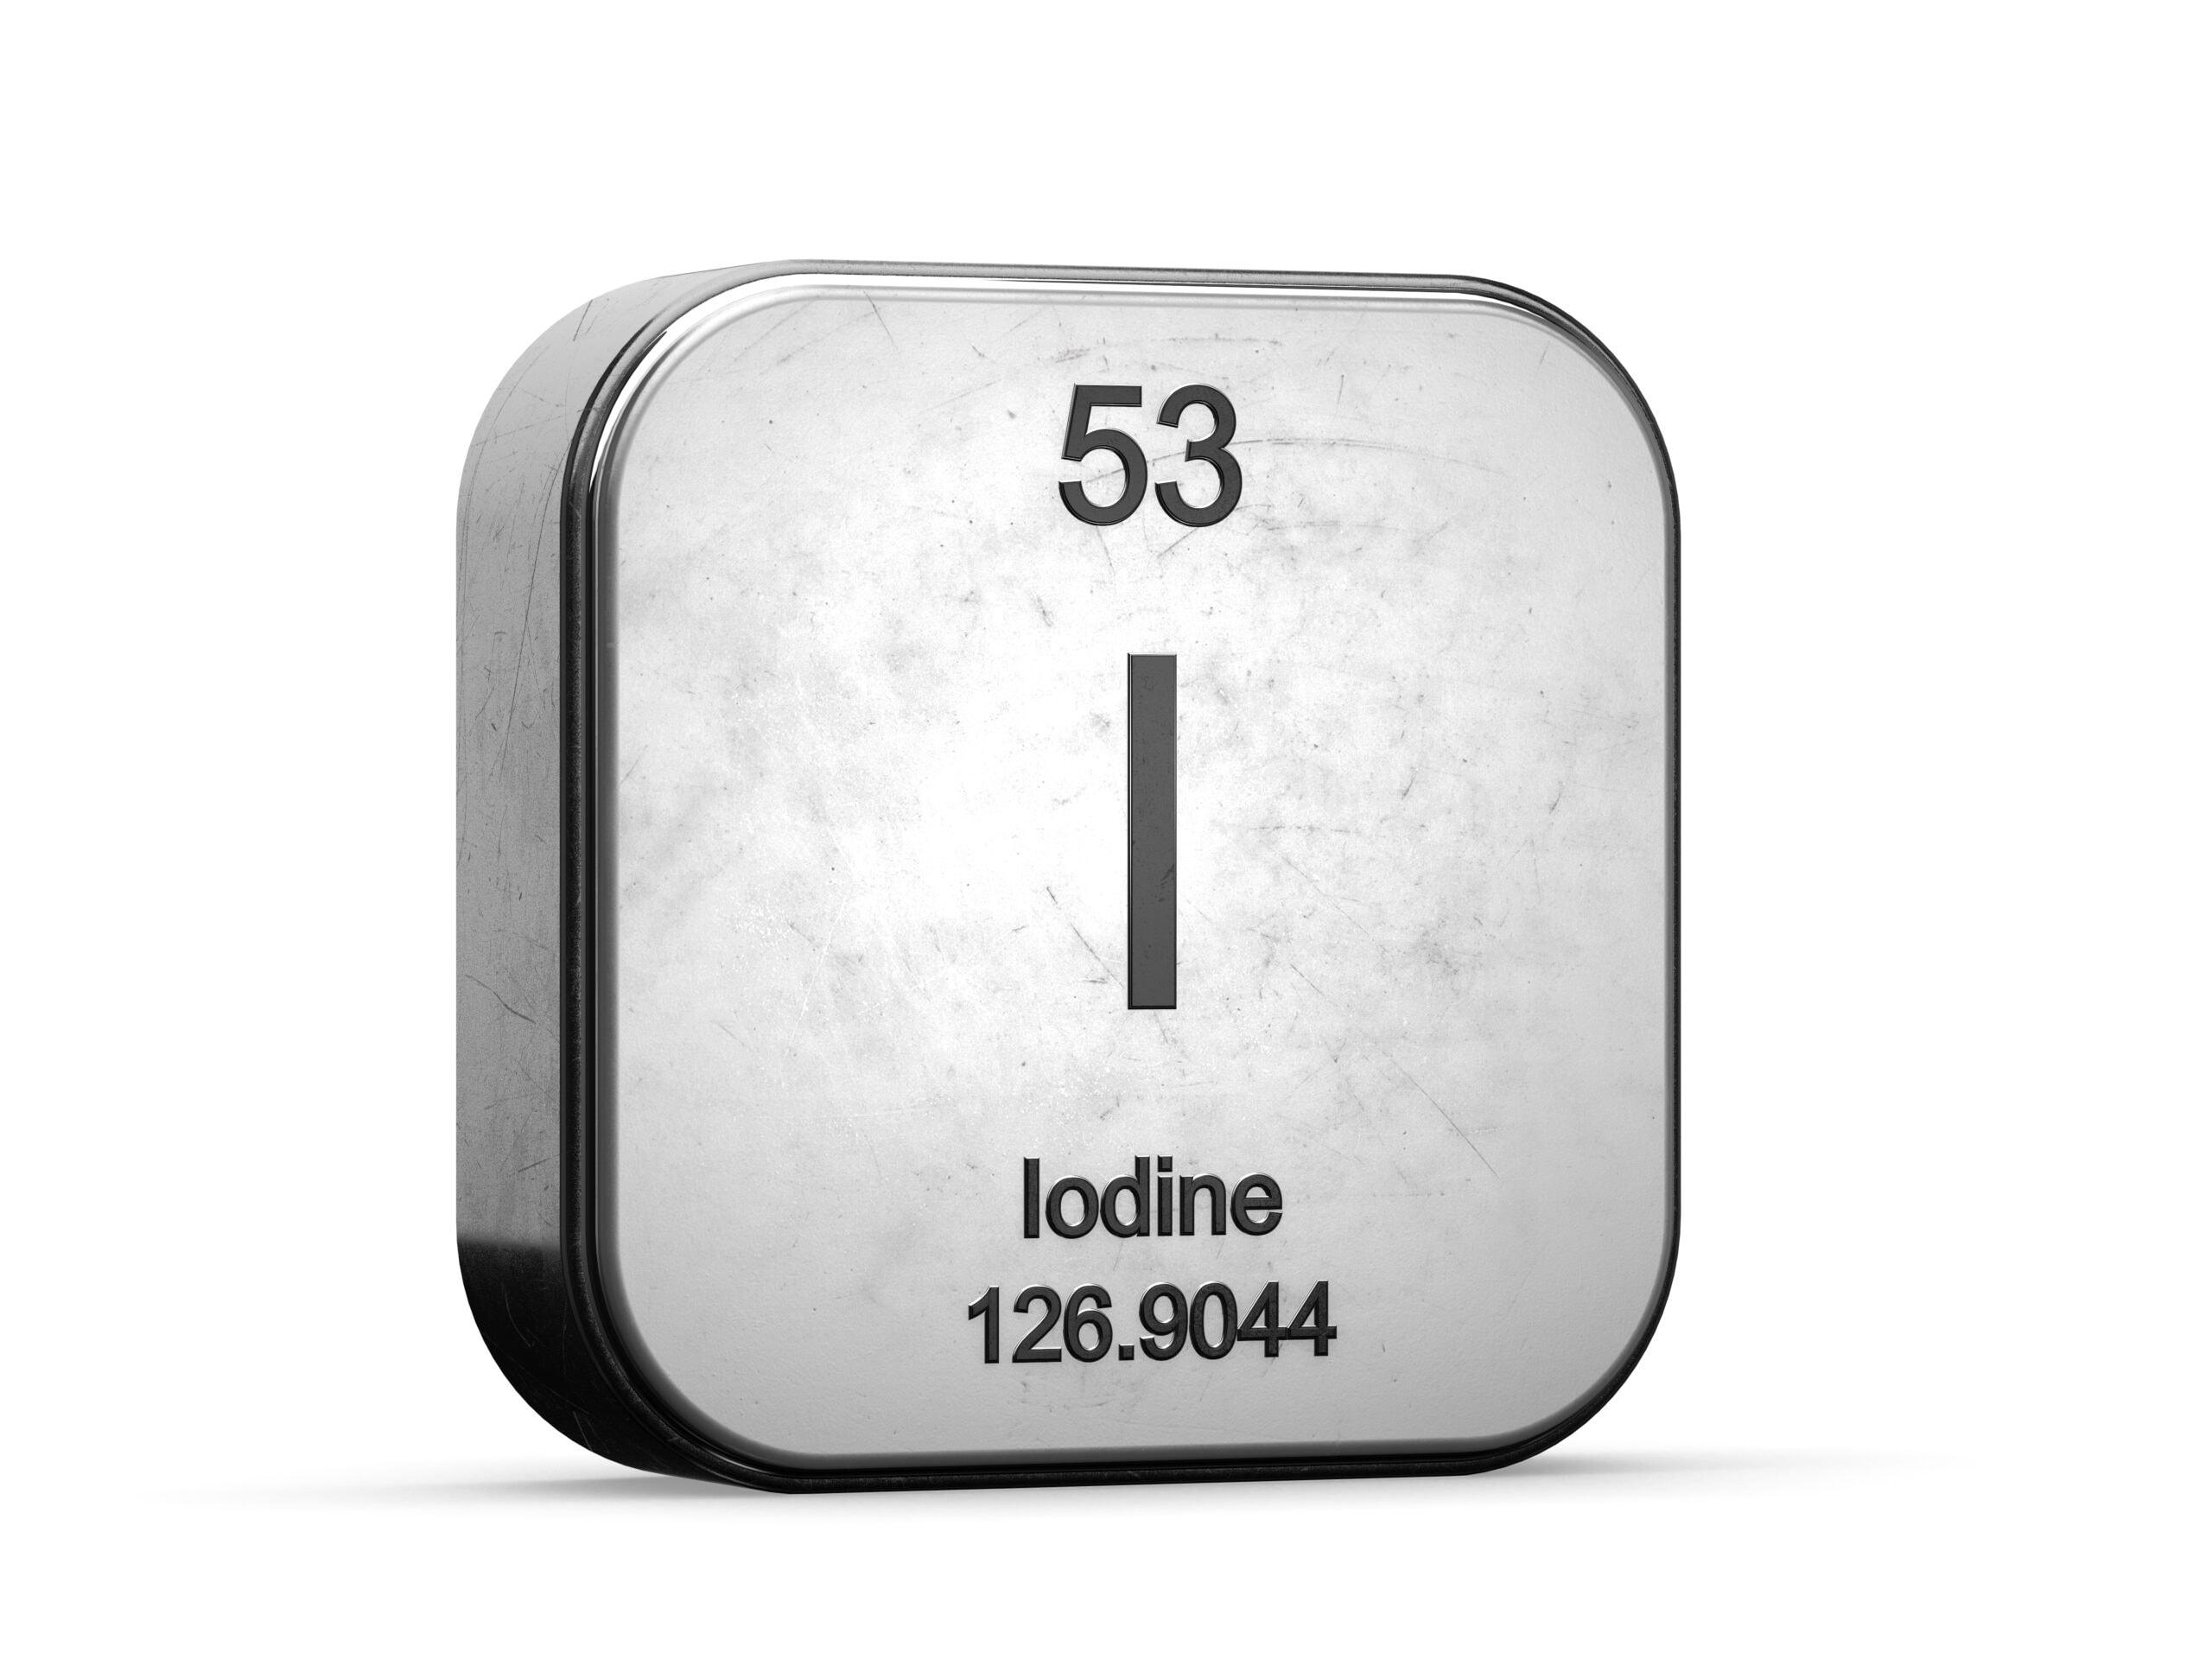 iodate atomic weight